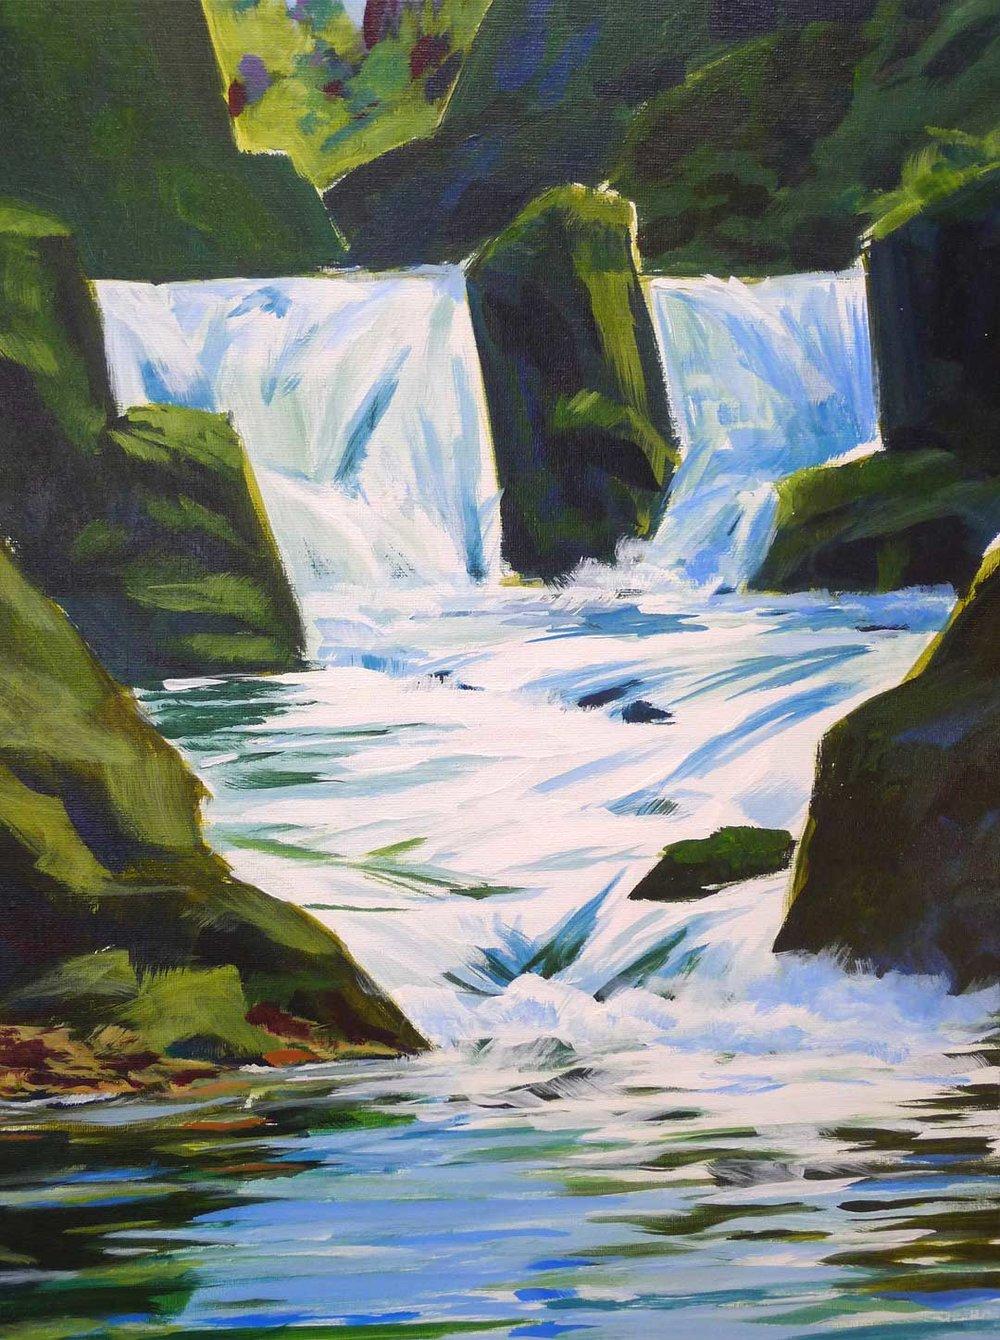 waterfall-paint-demo-7.jpg